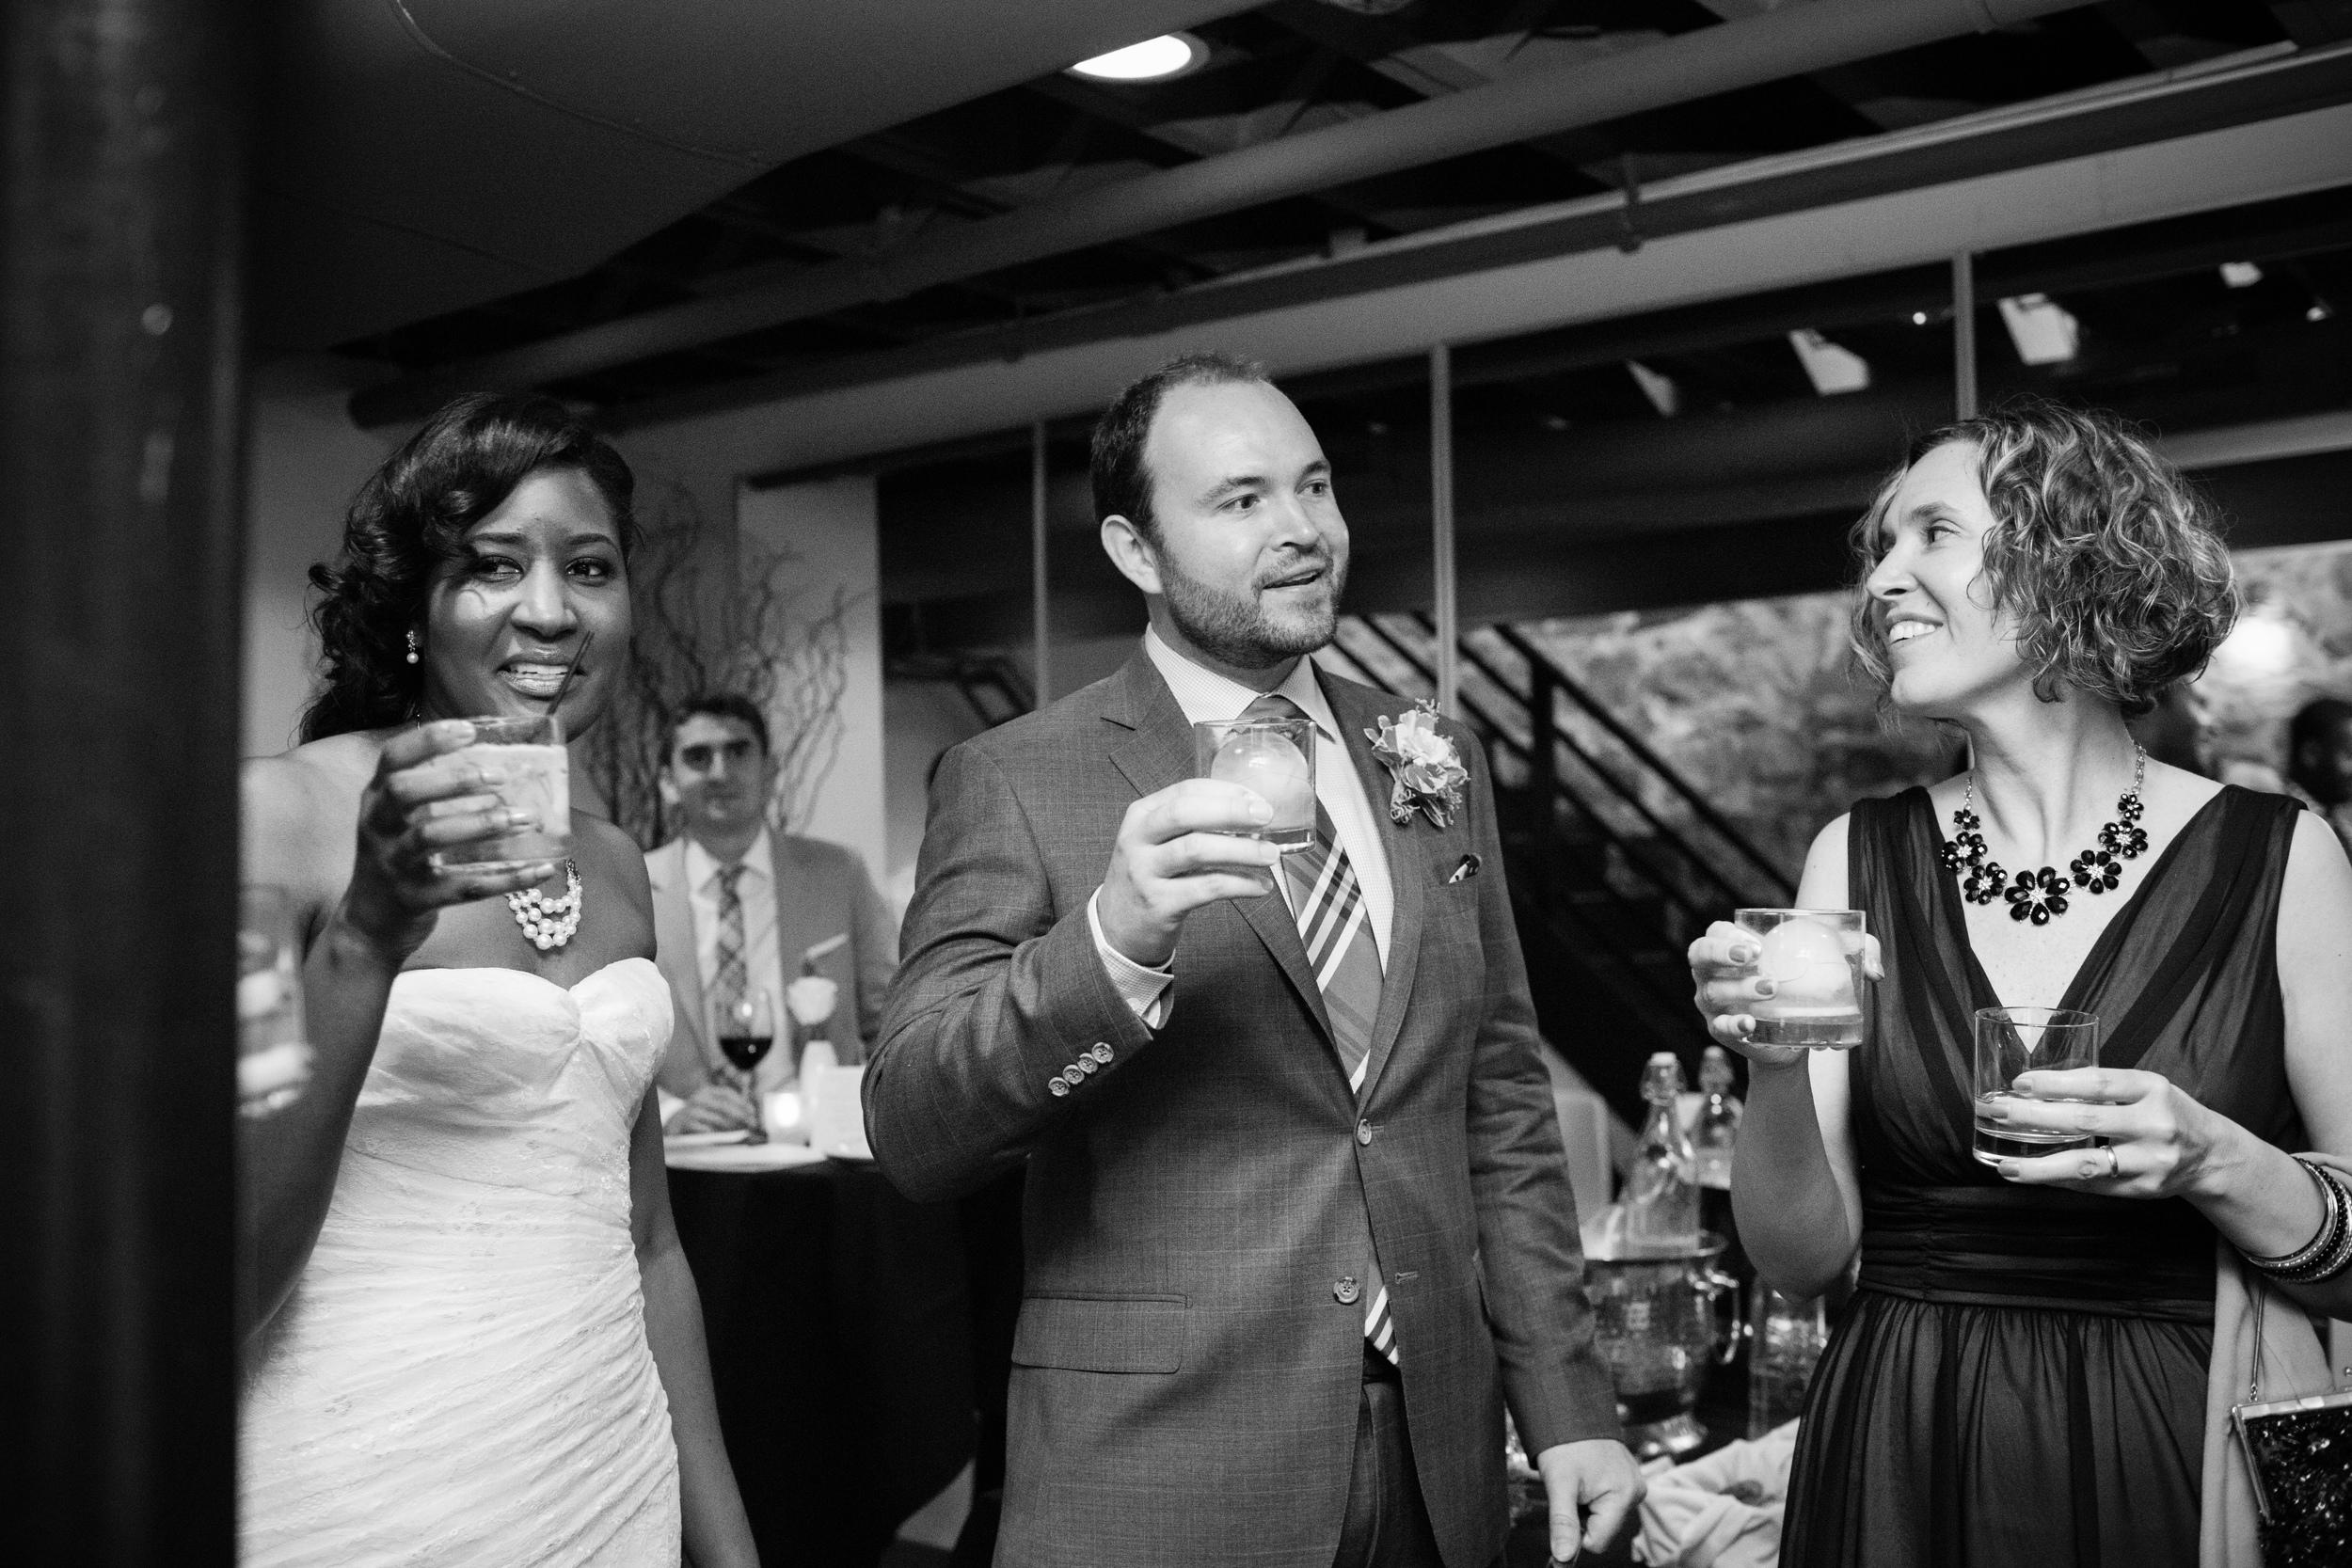 ann_arbor_weddings_014.JPG